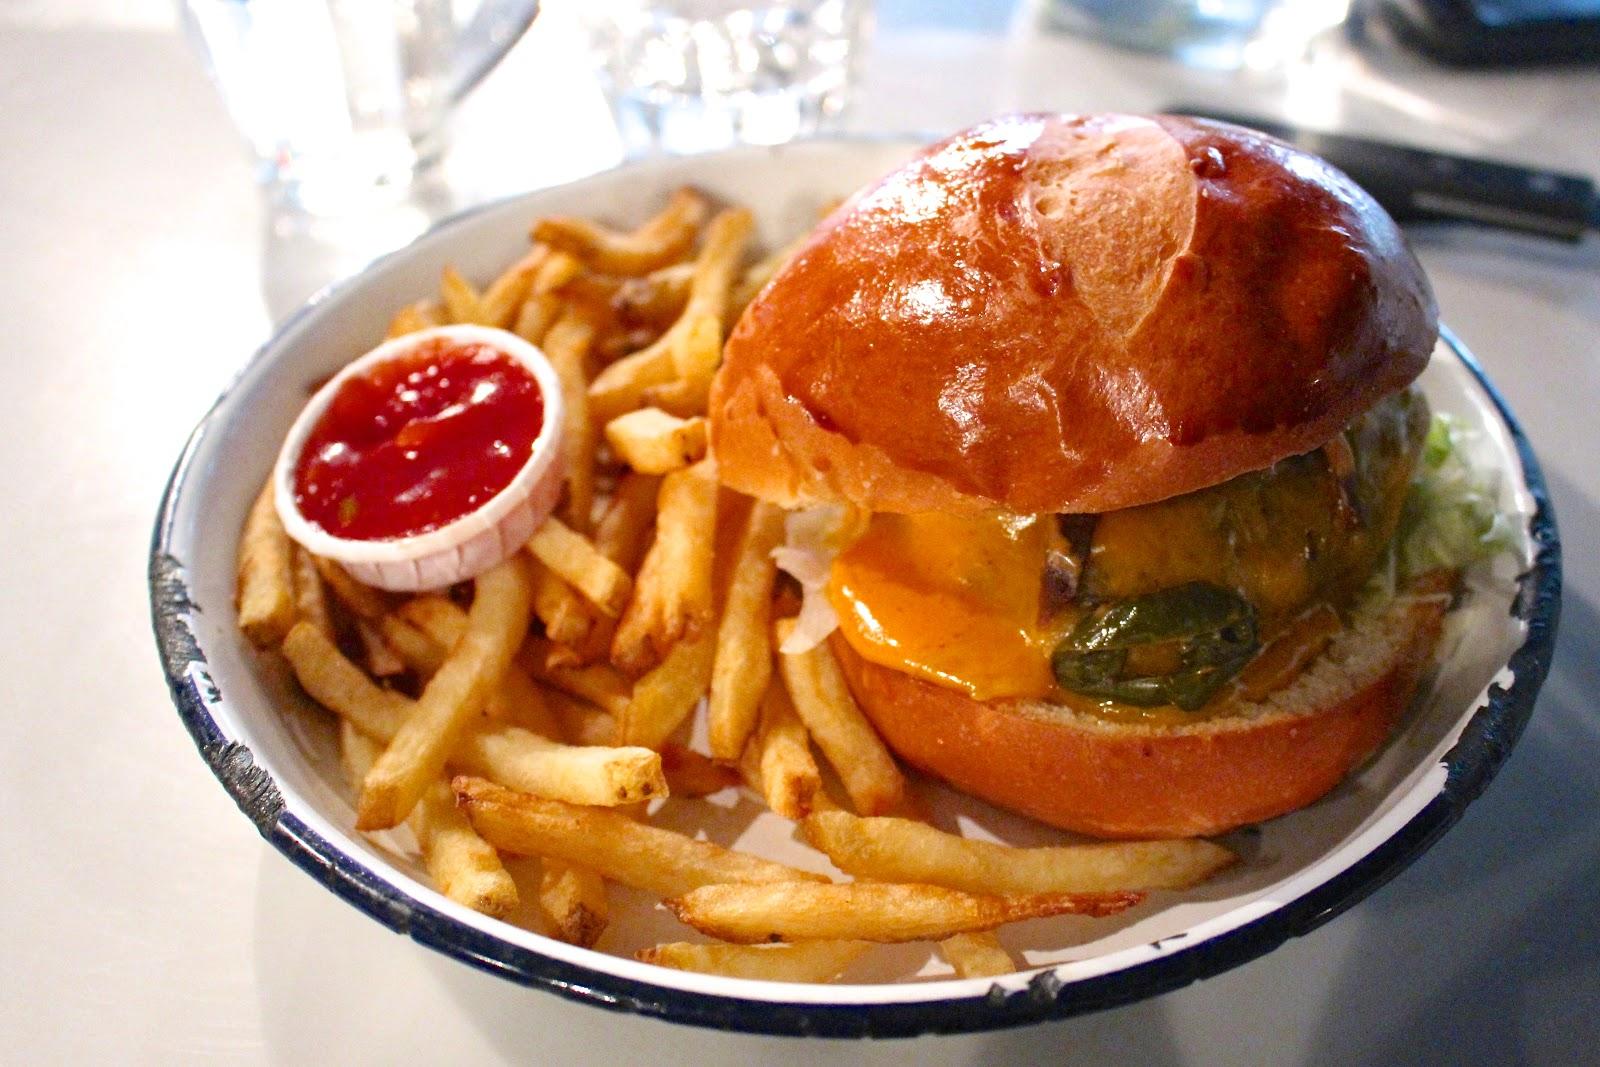 PNY Paris Sriracha Napalm burger